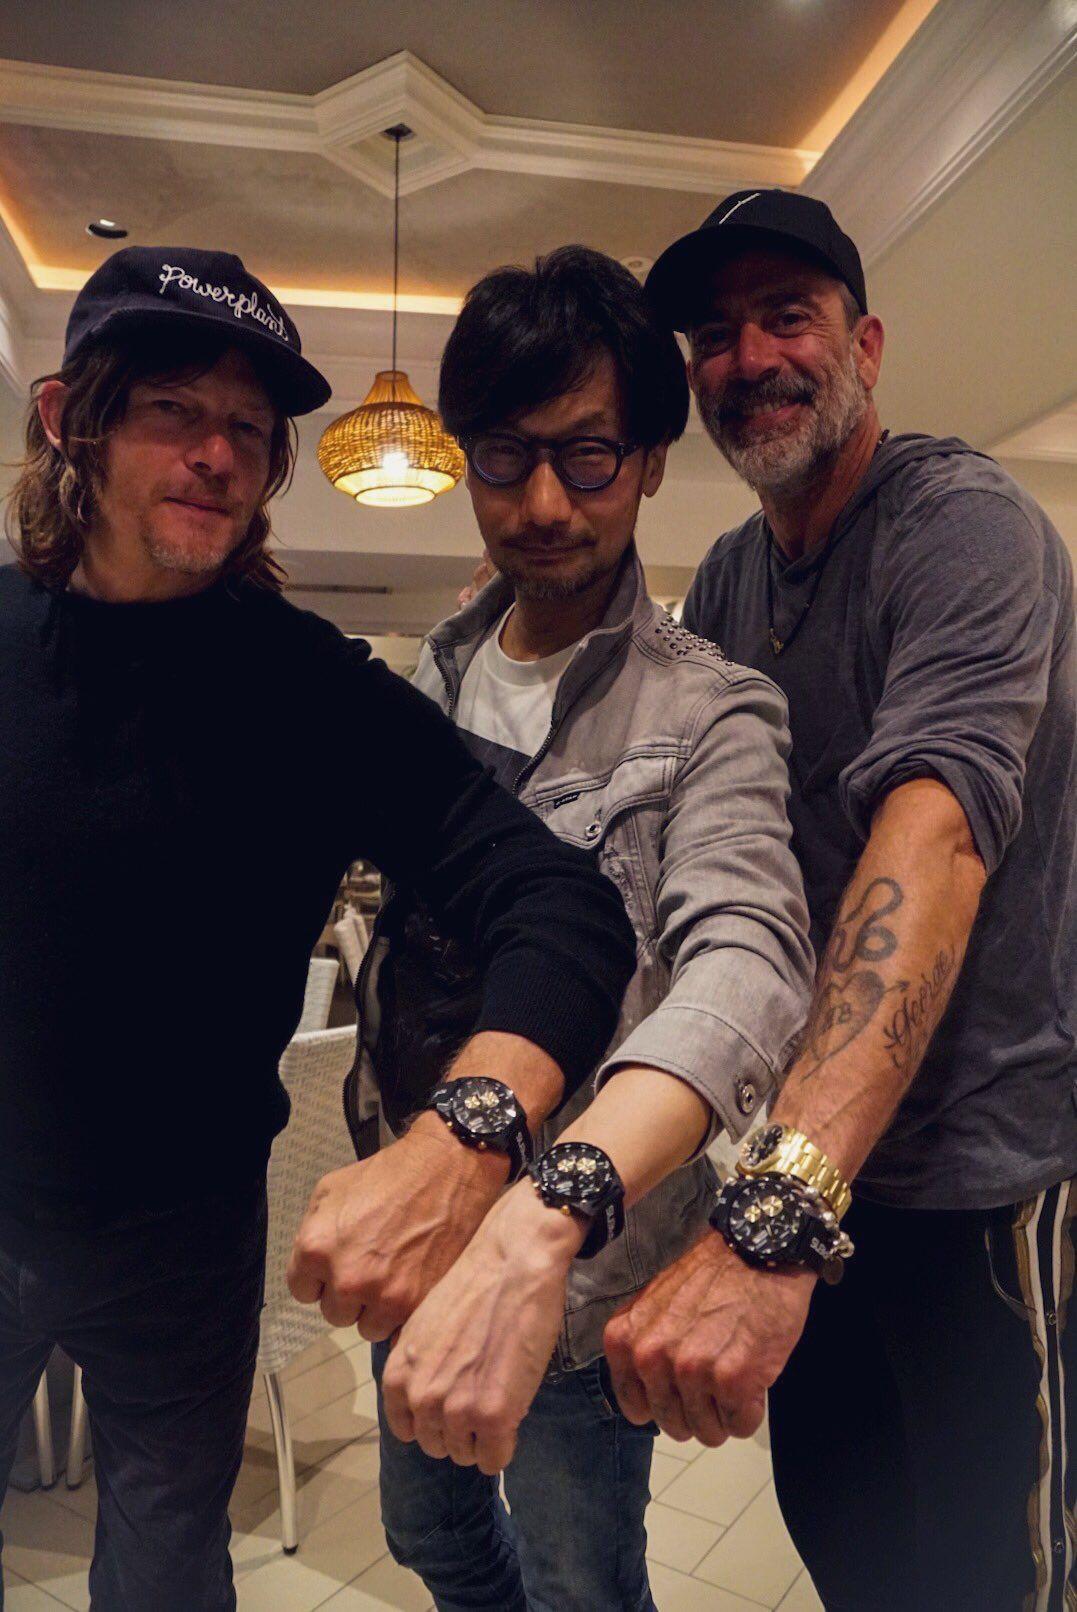 Hideo Kojima On Twitter Hideo Norman Reedus Actors Instagram.com/bigbaldhead снапчат нормана забыли пароль? norman reedus